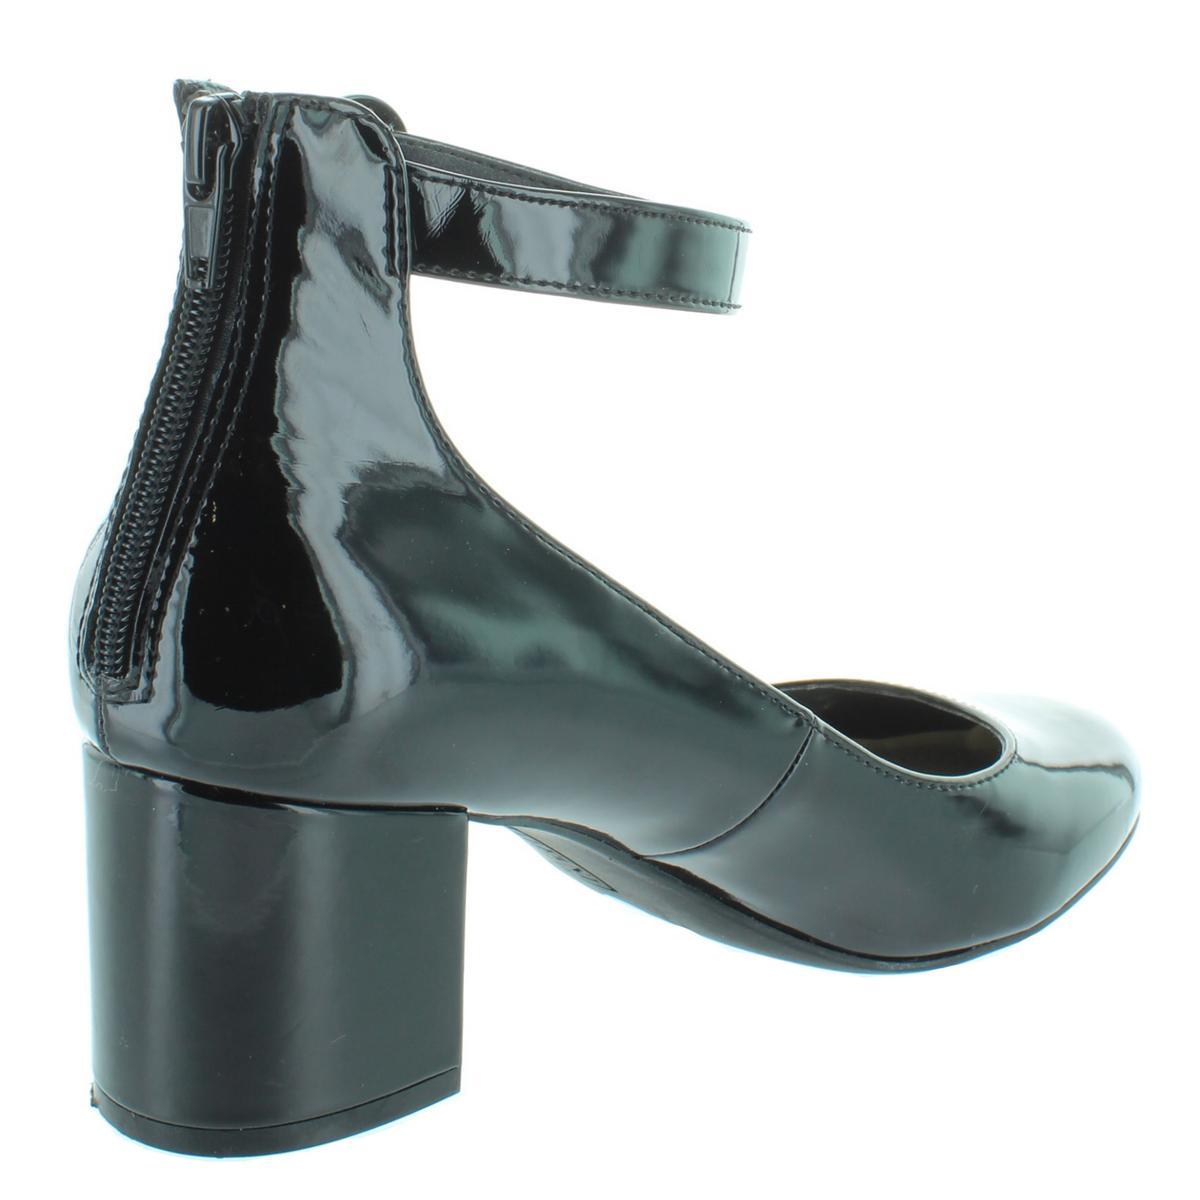 Alfani-Femme-ashiaa-Cheville-Sangle-Escarpins-Chaussures-BHFO-5590 miniature 5